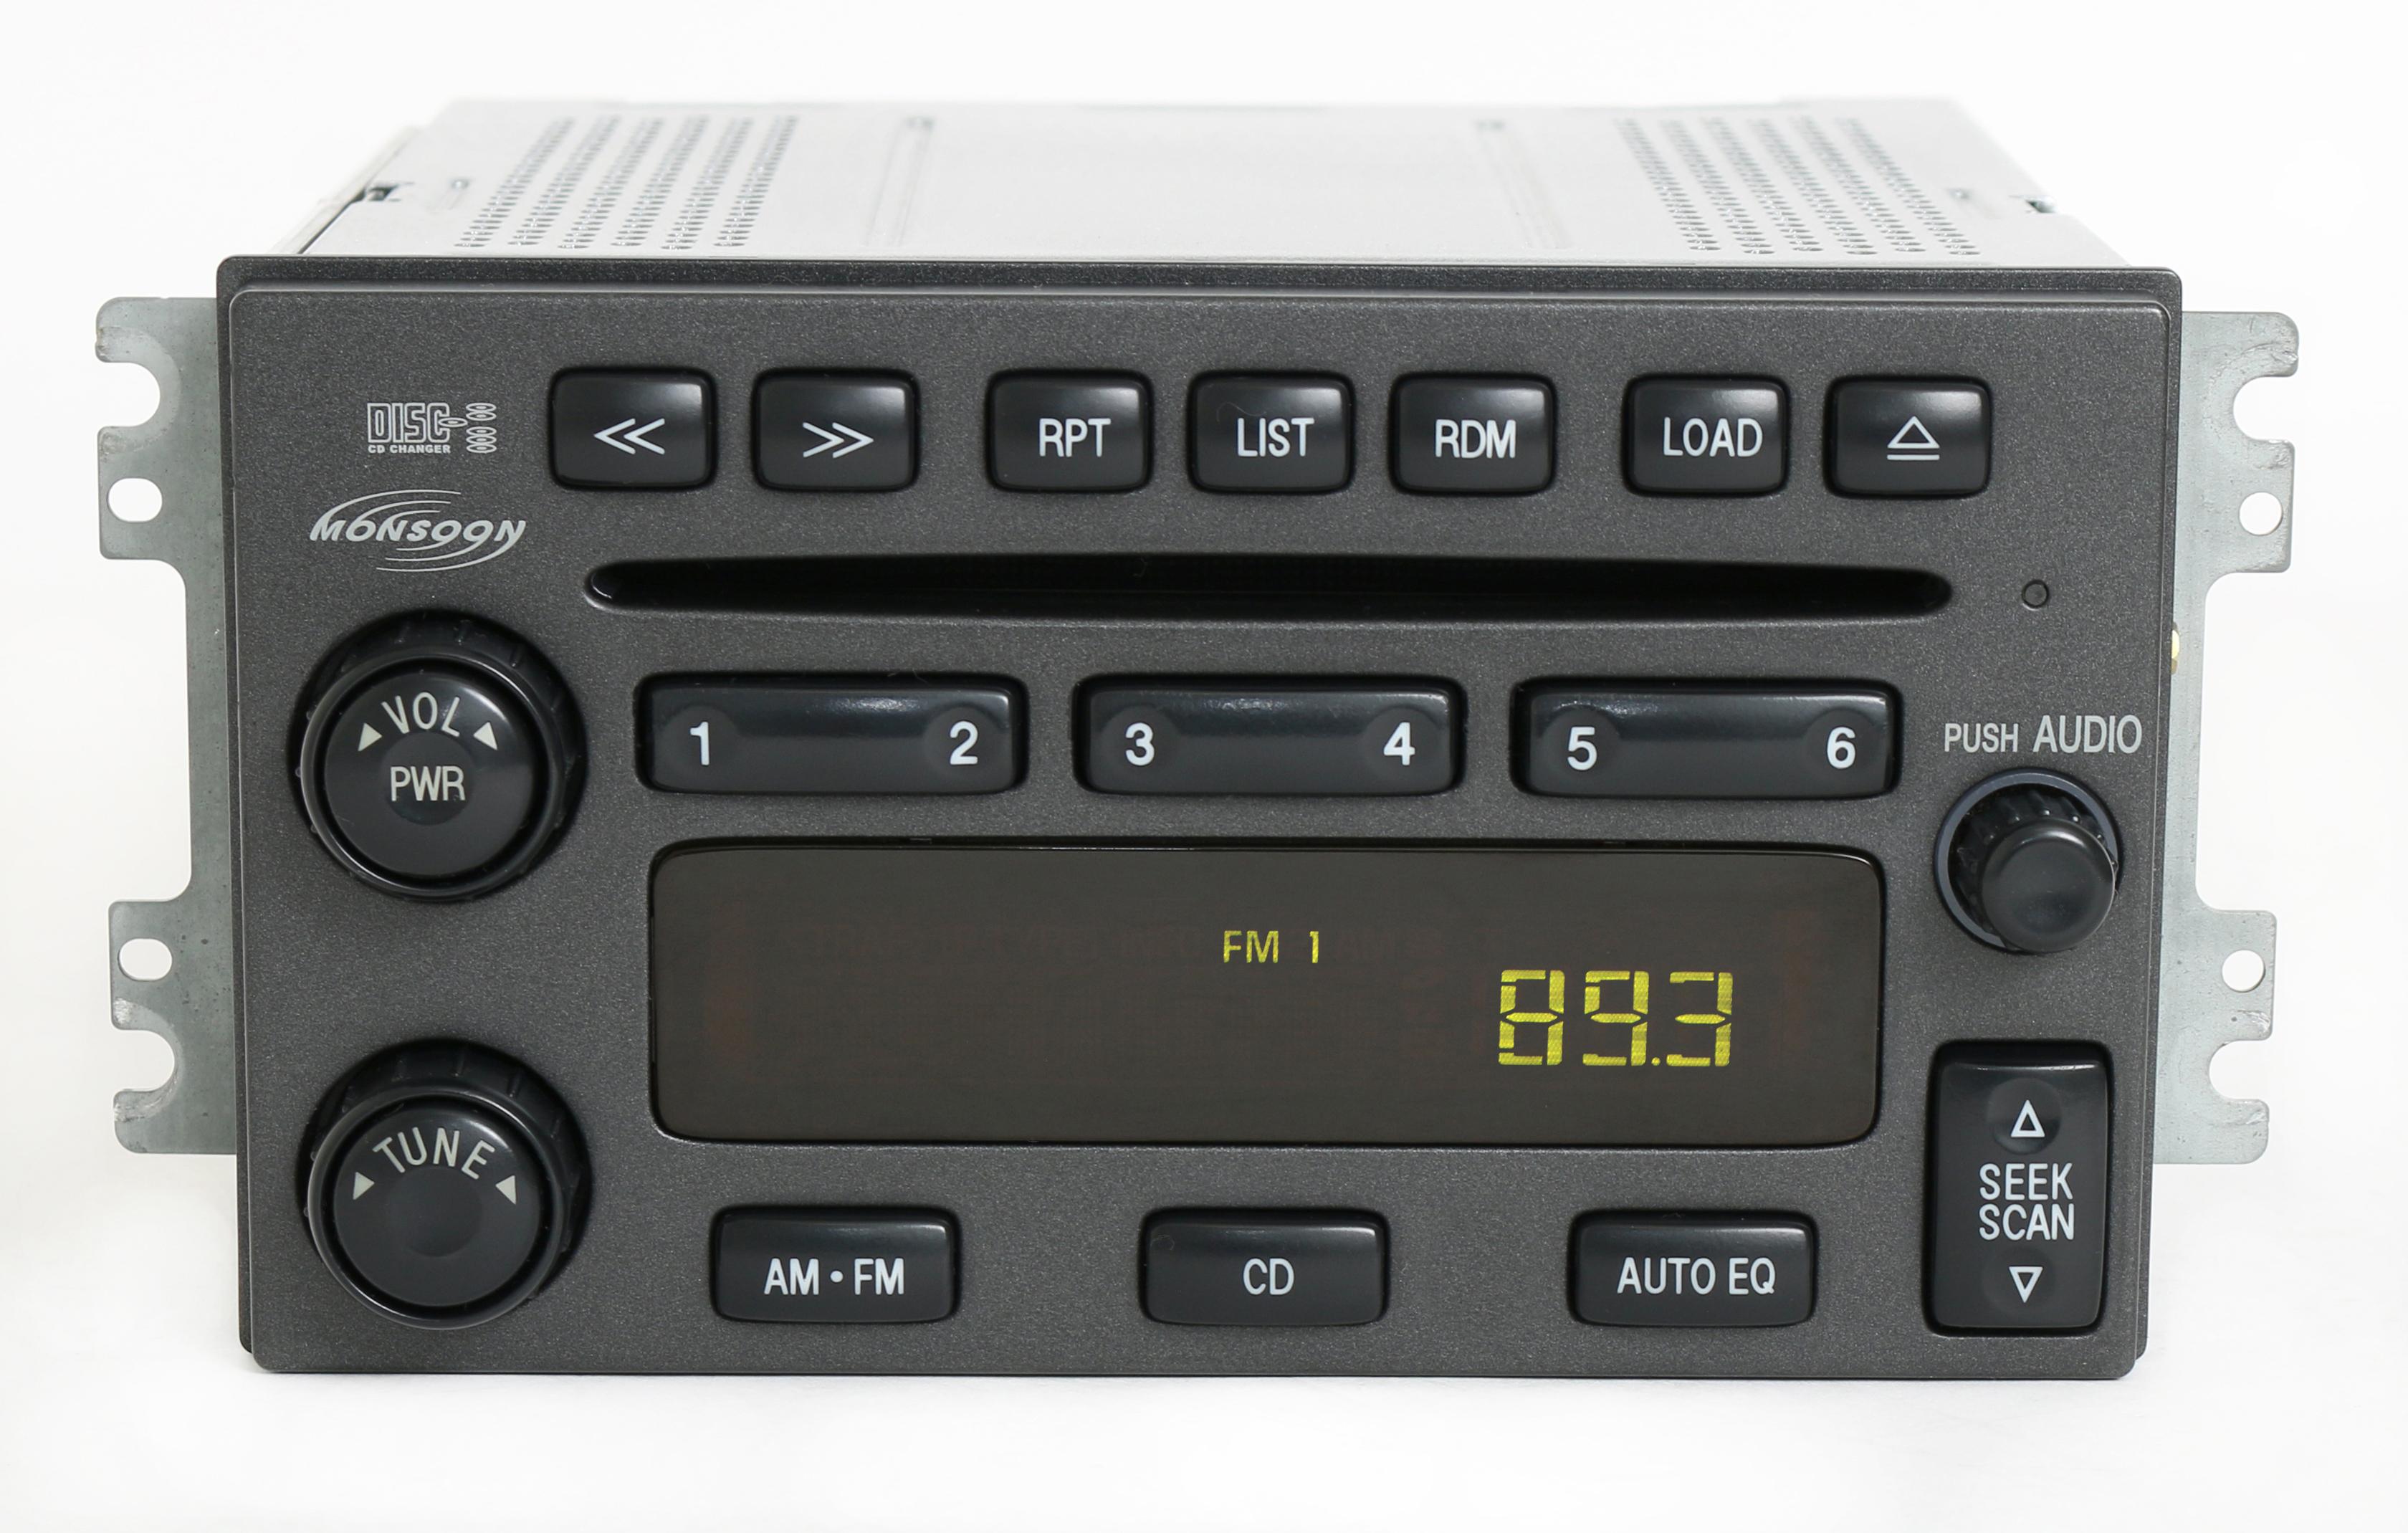 2005 Hyundai Santa Fe Car Stereo Radio Wiring Diagram Share The